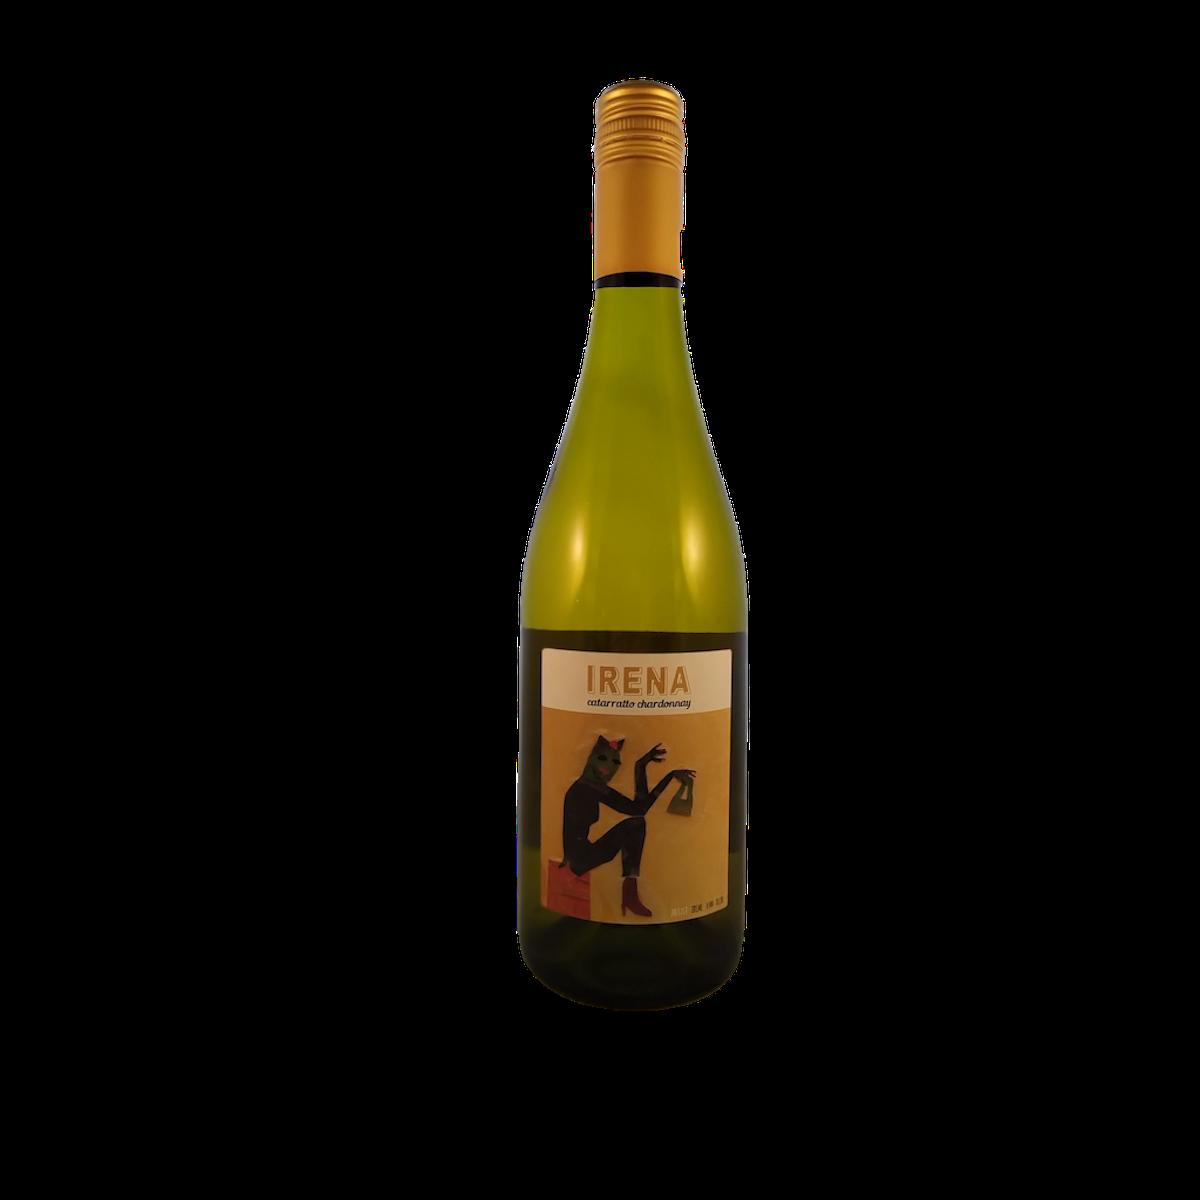 Irena, Chardonnay/Catarratto